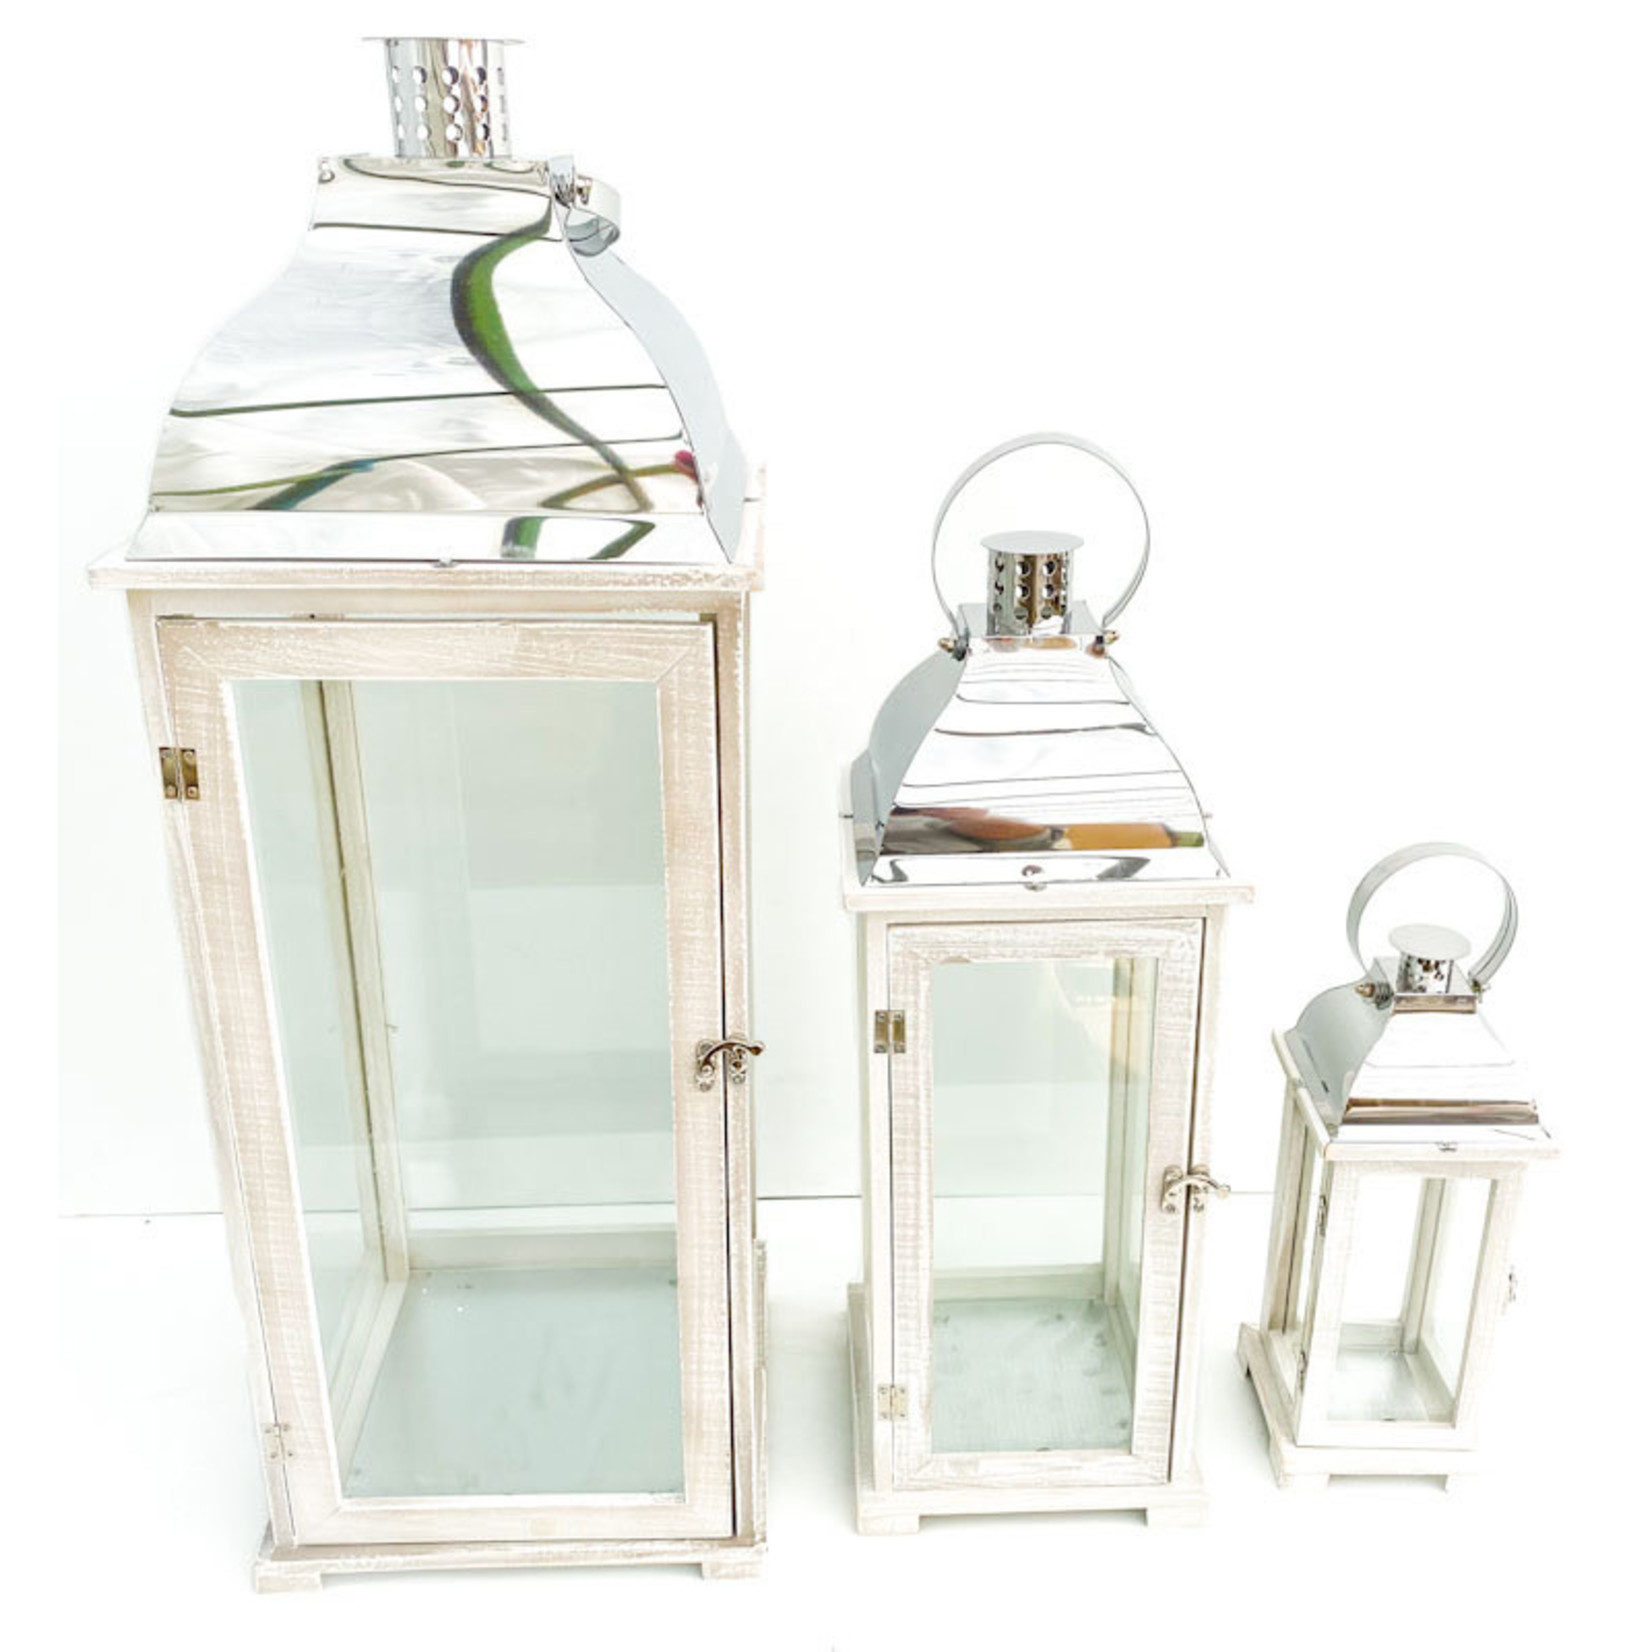 Lantern - white with silver top